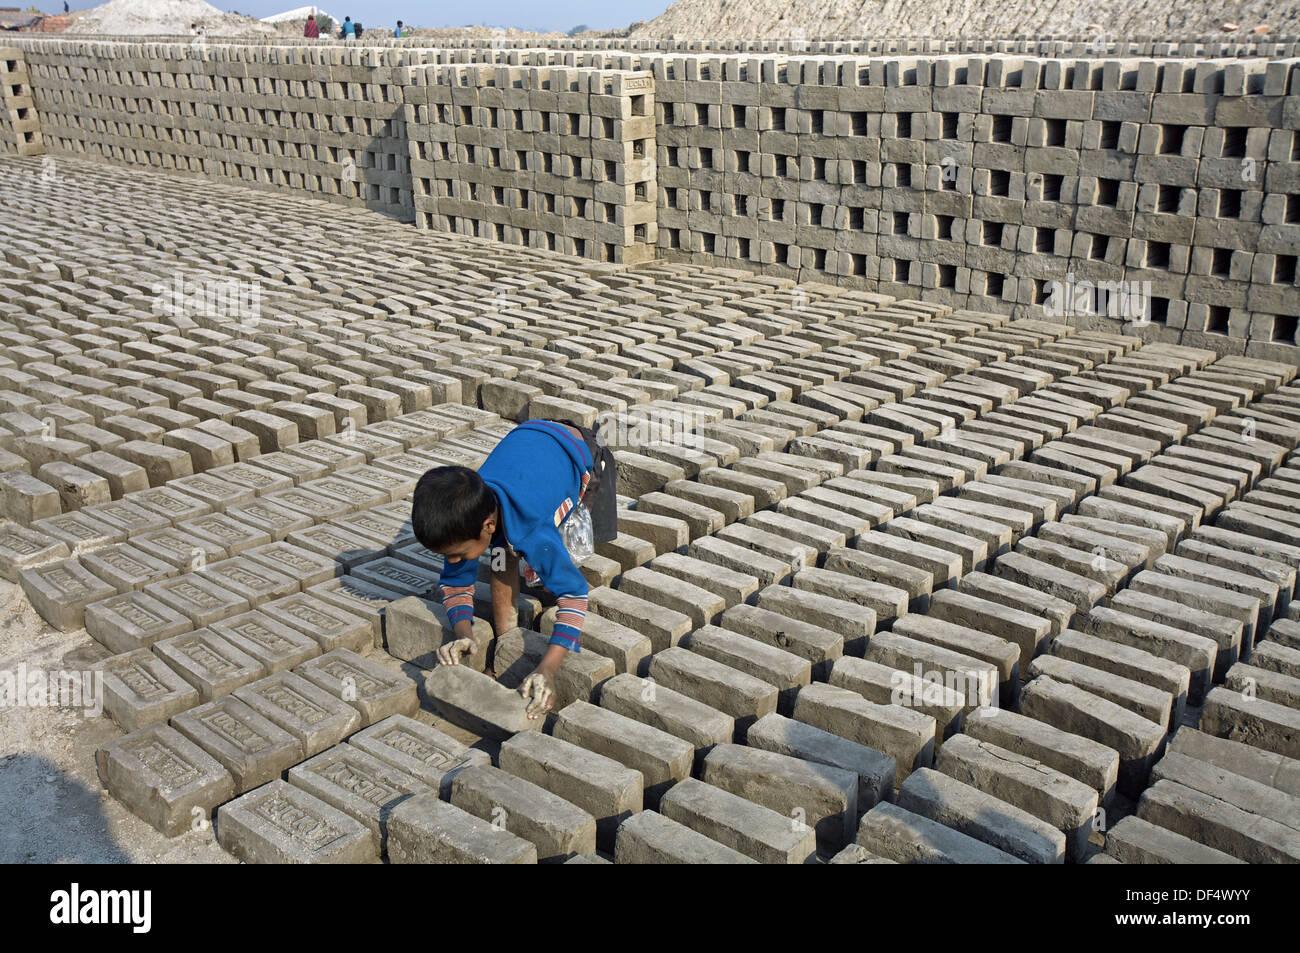 Children working on a brick factory. Near Kolkata. Ganges River. India. - Stock Image